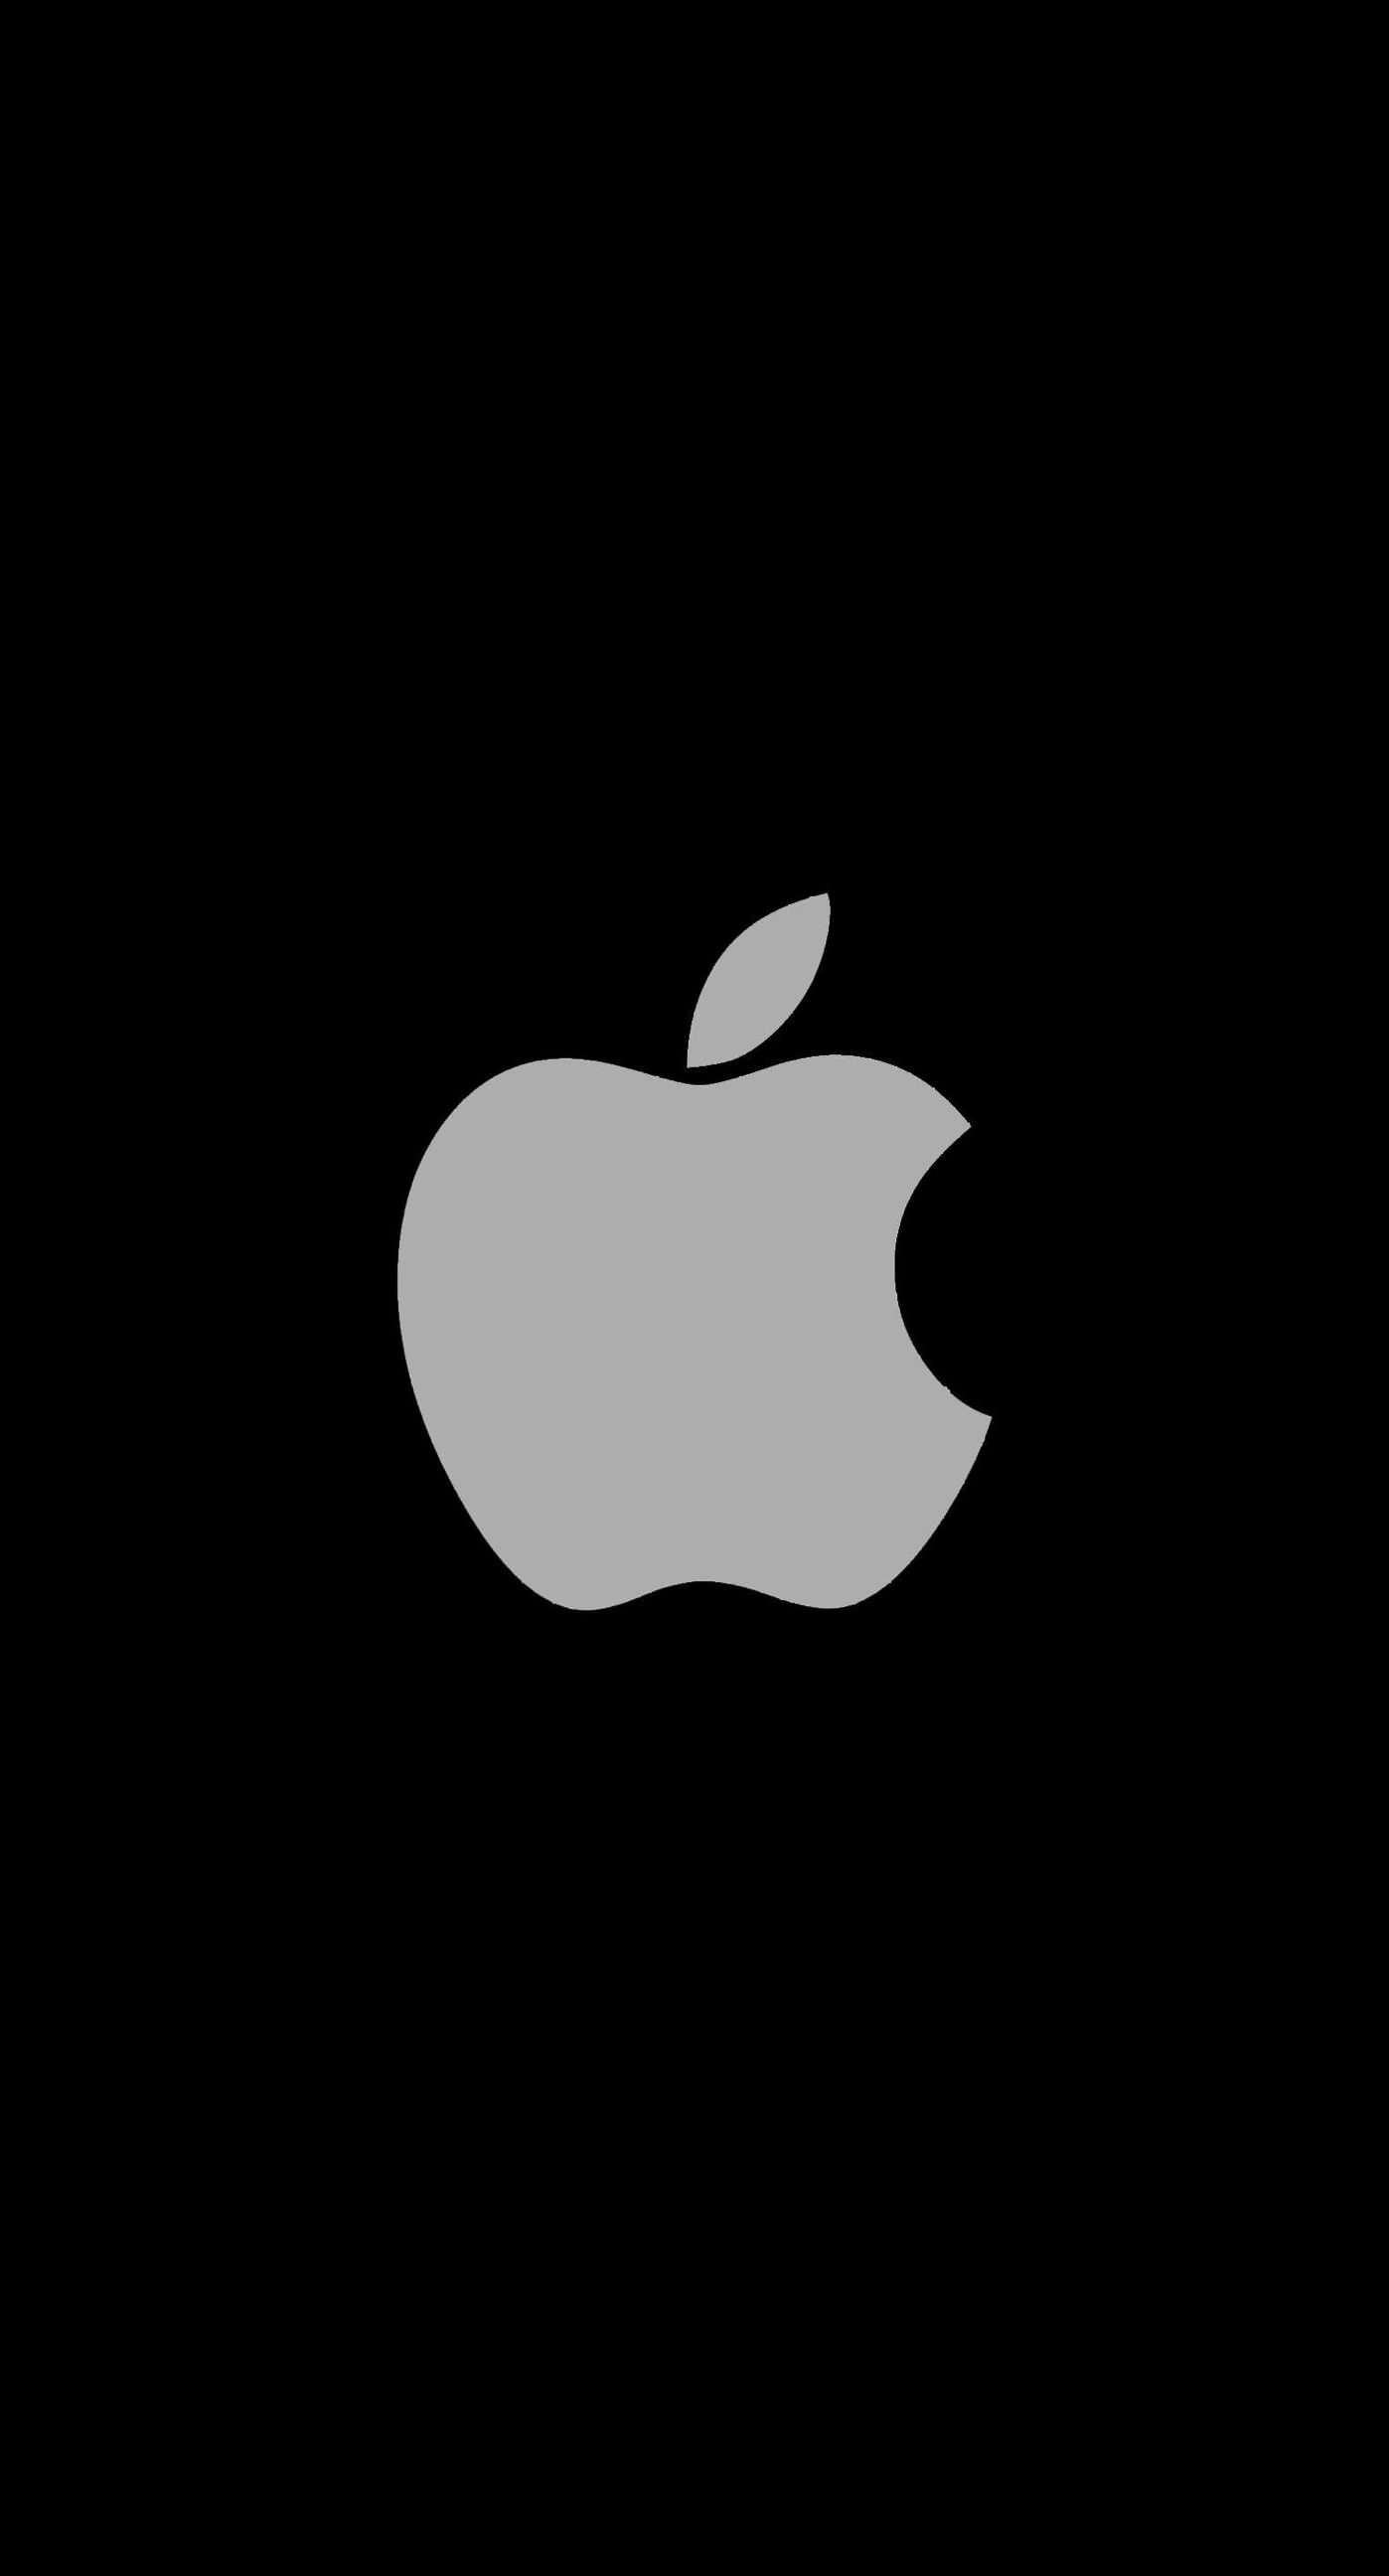 Wallpaper iphone hitam - Apple Logo Black Cool Iphone7 Plus Wallpaper